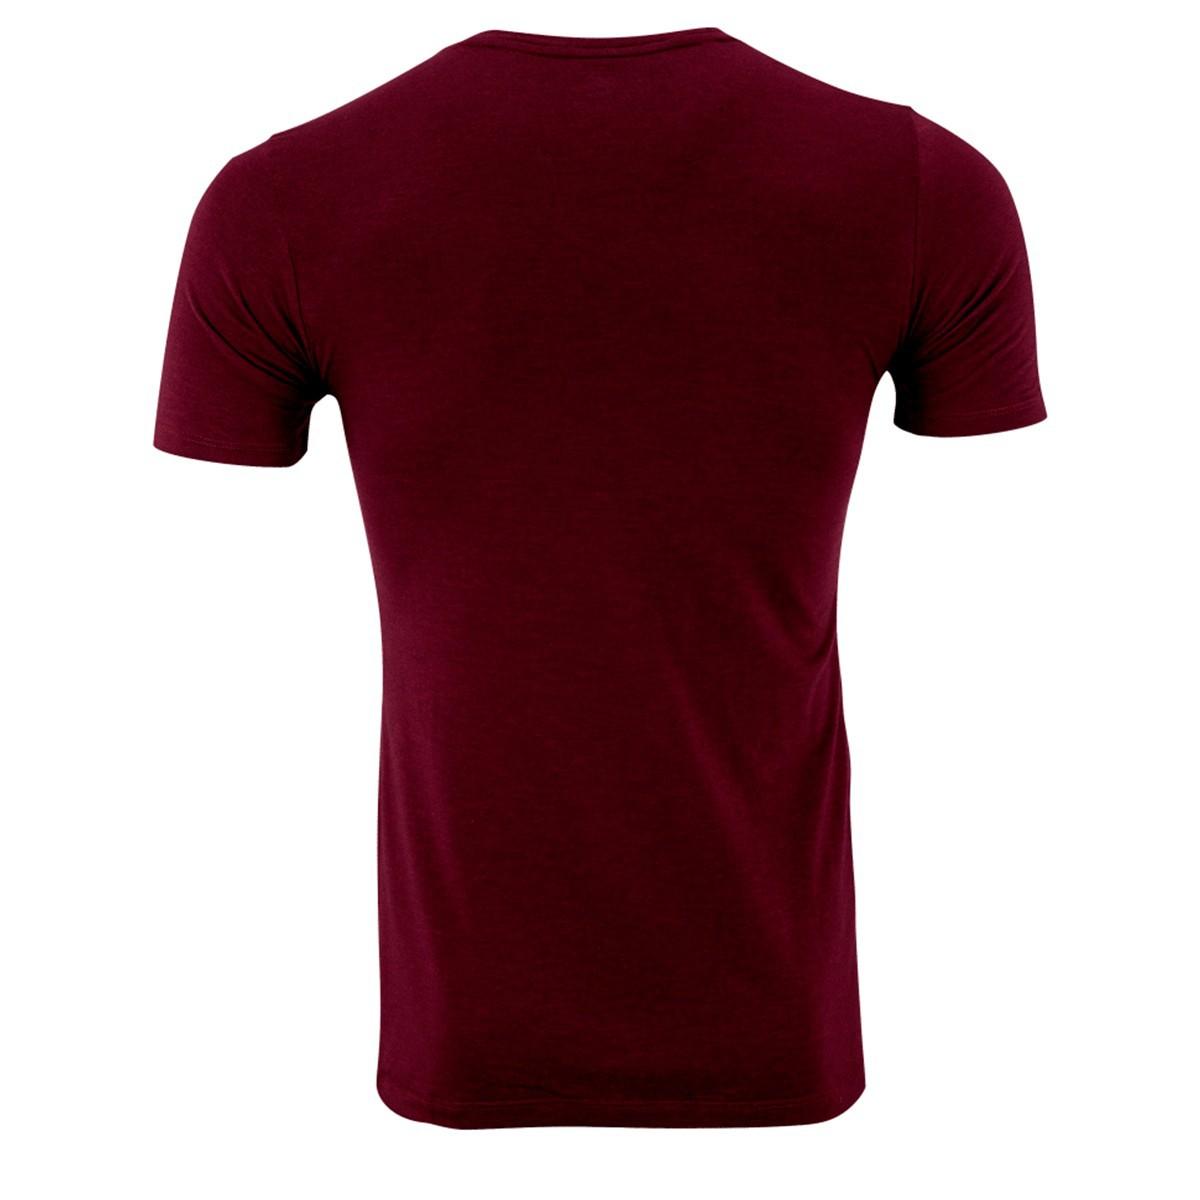 Camiseta Umbro TWR Paint Graphic Masculino Vinho